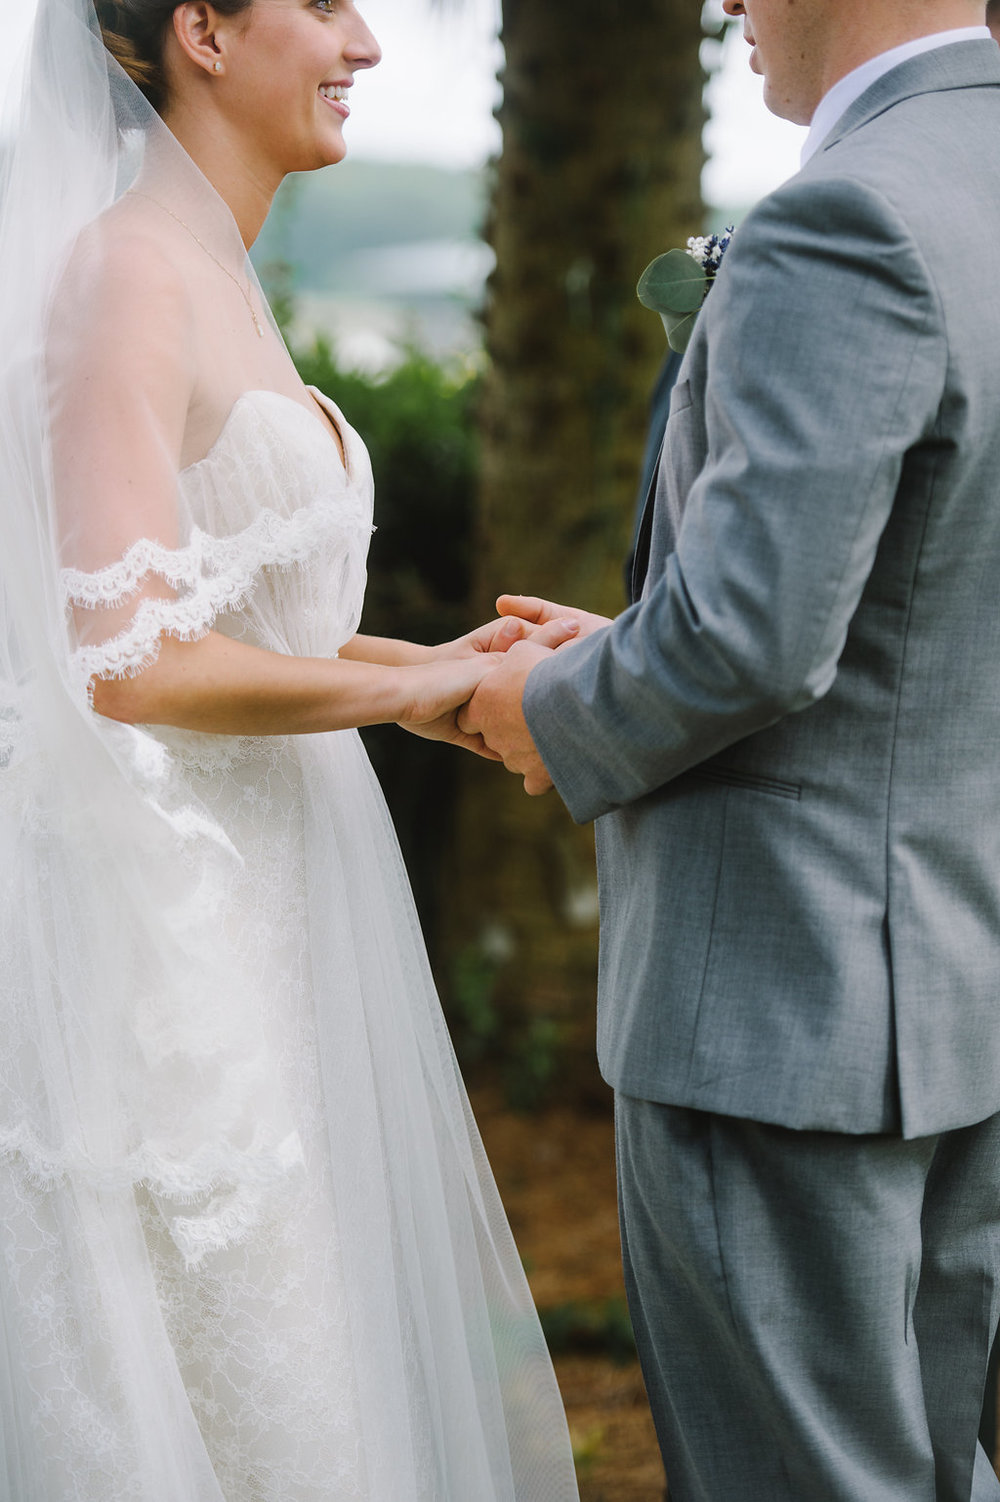 meagan-and-brenden-rach-loves-troy-photography-ivory-and-beau-bridal-boutqiue-ti-adora-wedding-dress-gold-lace-wedding-dress-savannah-wedding-planner-savannah-weddings-oldfield-plantation-wedding-savannah-florist-77.jpg